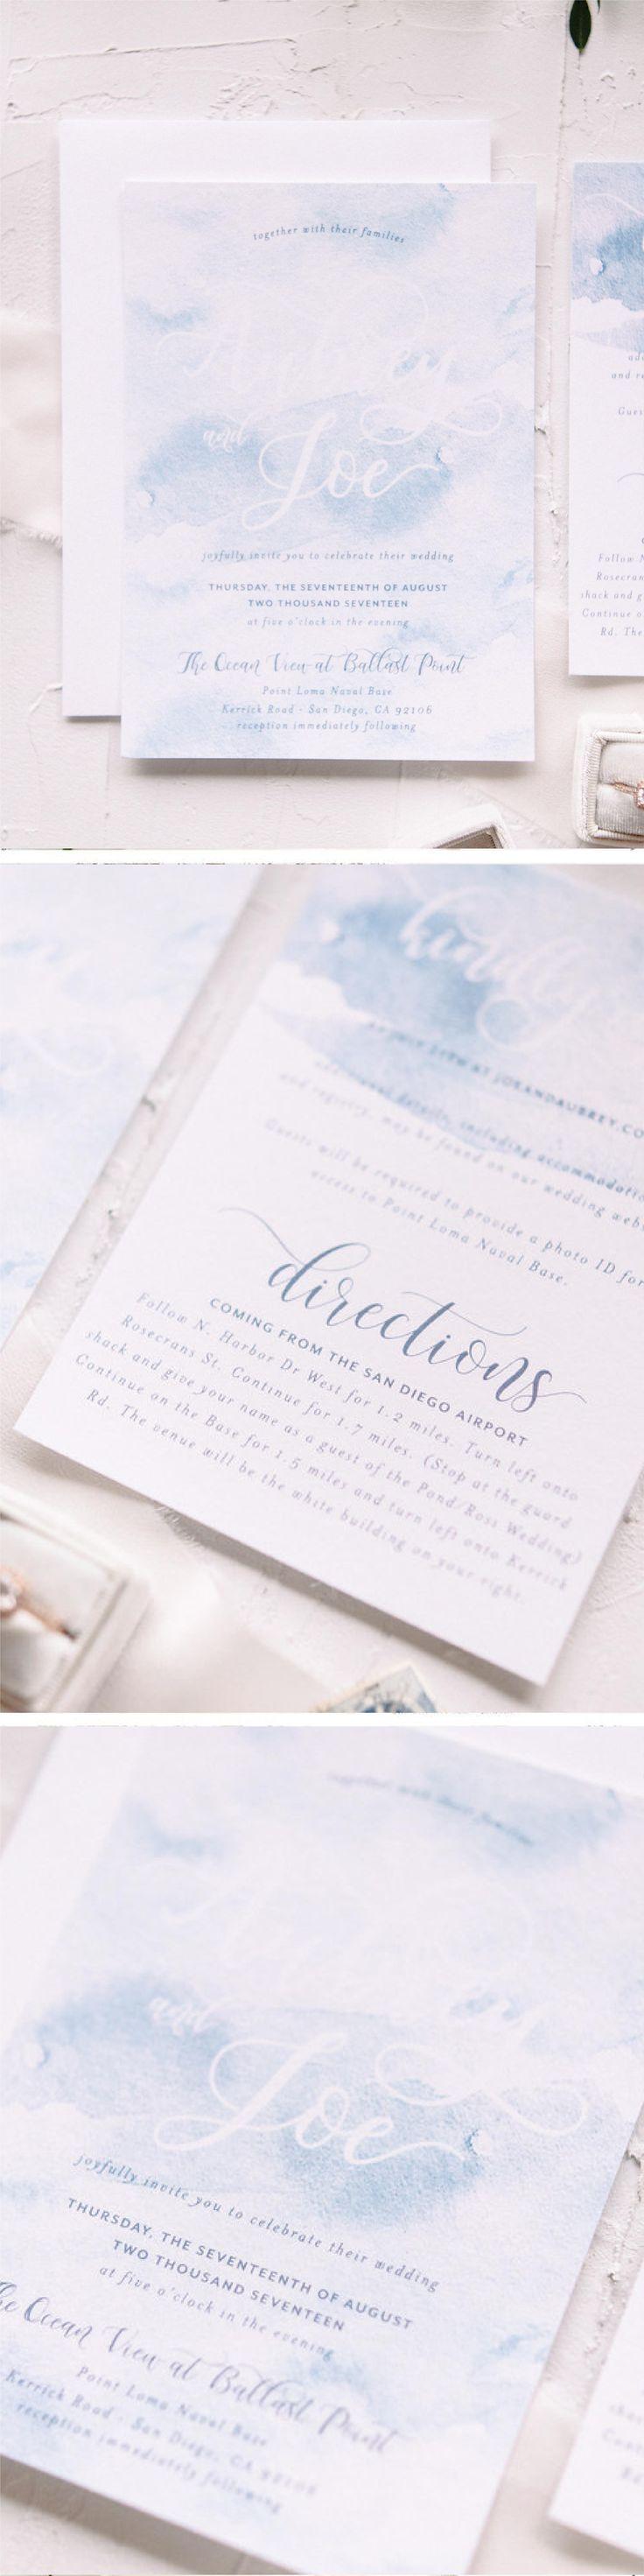 wedding invitations atlanta%0A Romantic baby blue watercolor wash wedding invitation by Blush Paper Co